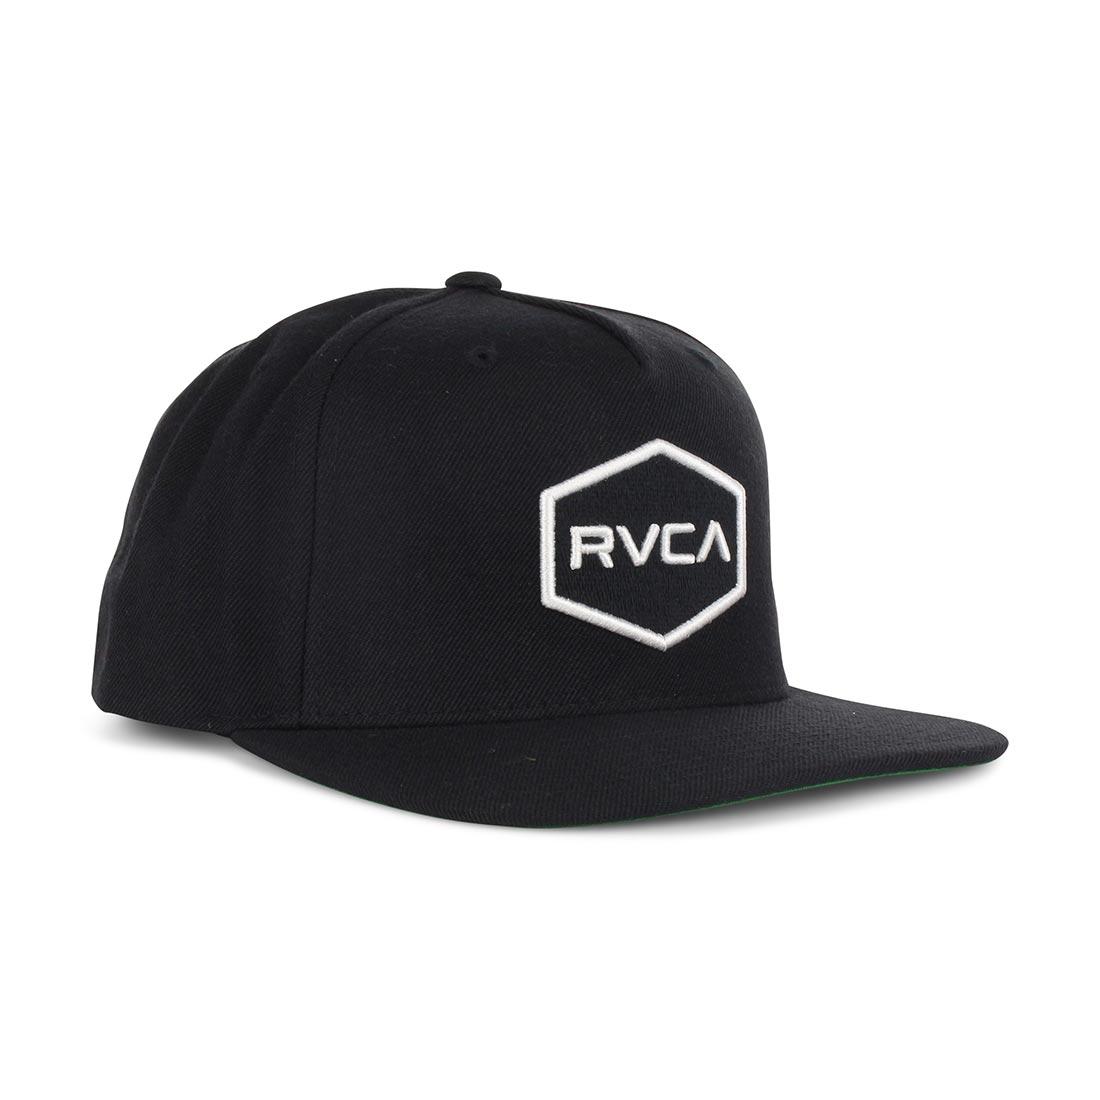 huge selection of 766ea cea2f RVCA Commonwealth Snapback Hat – Black White